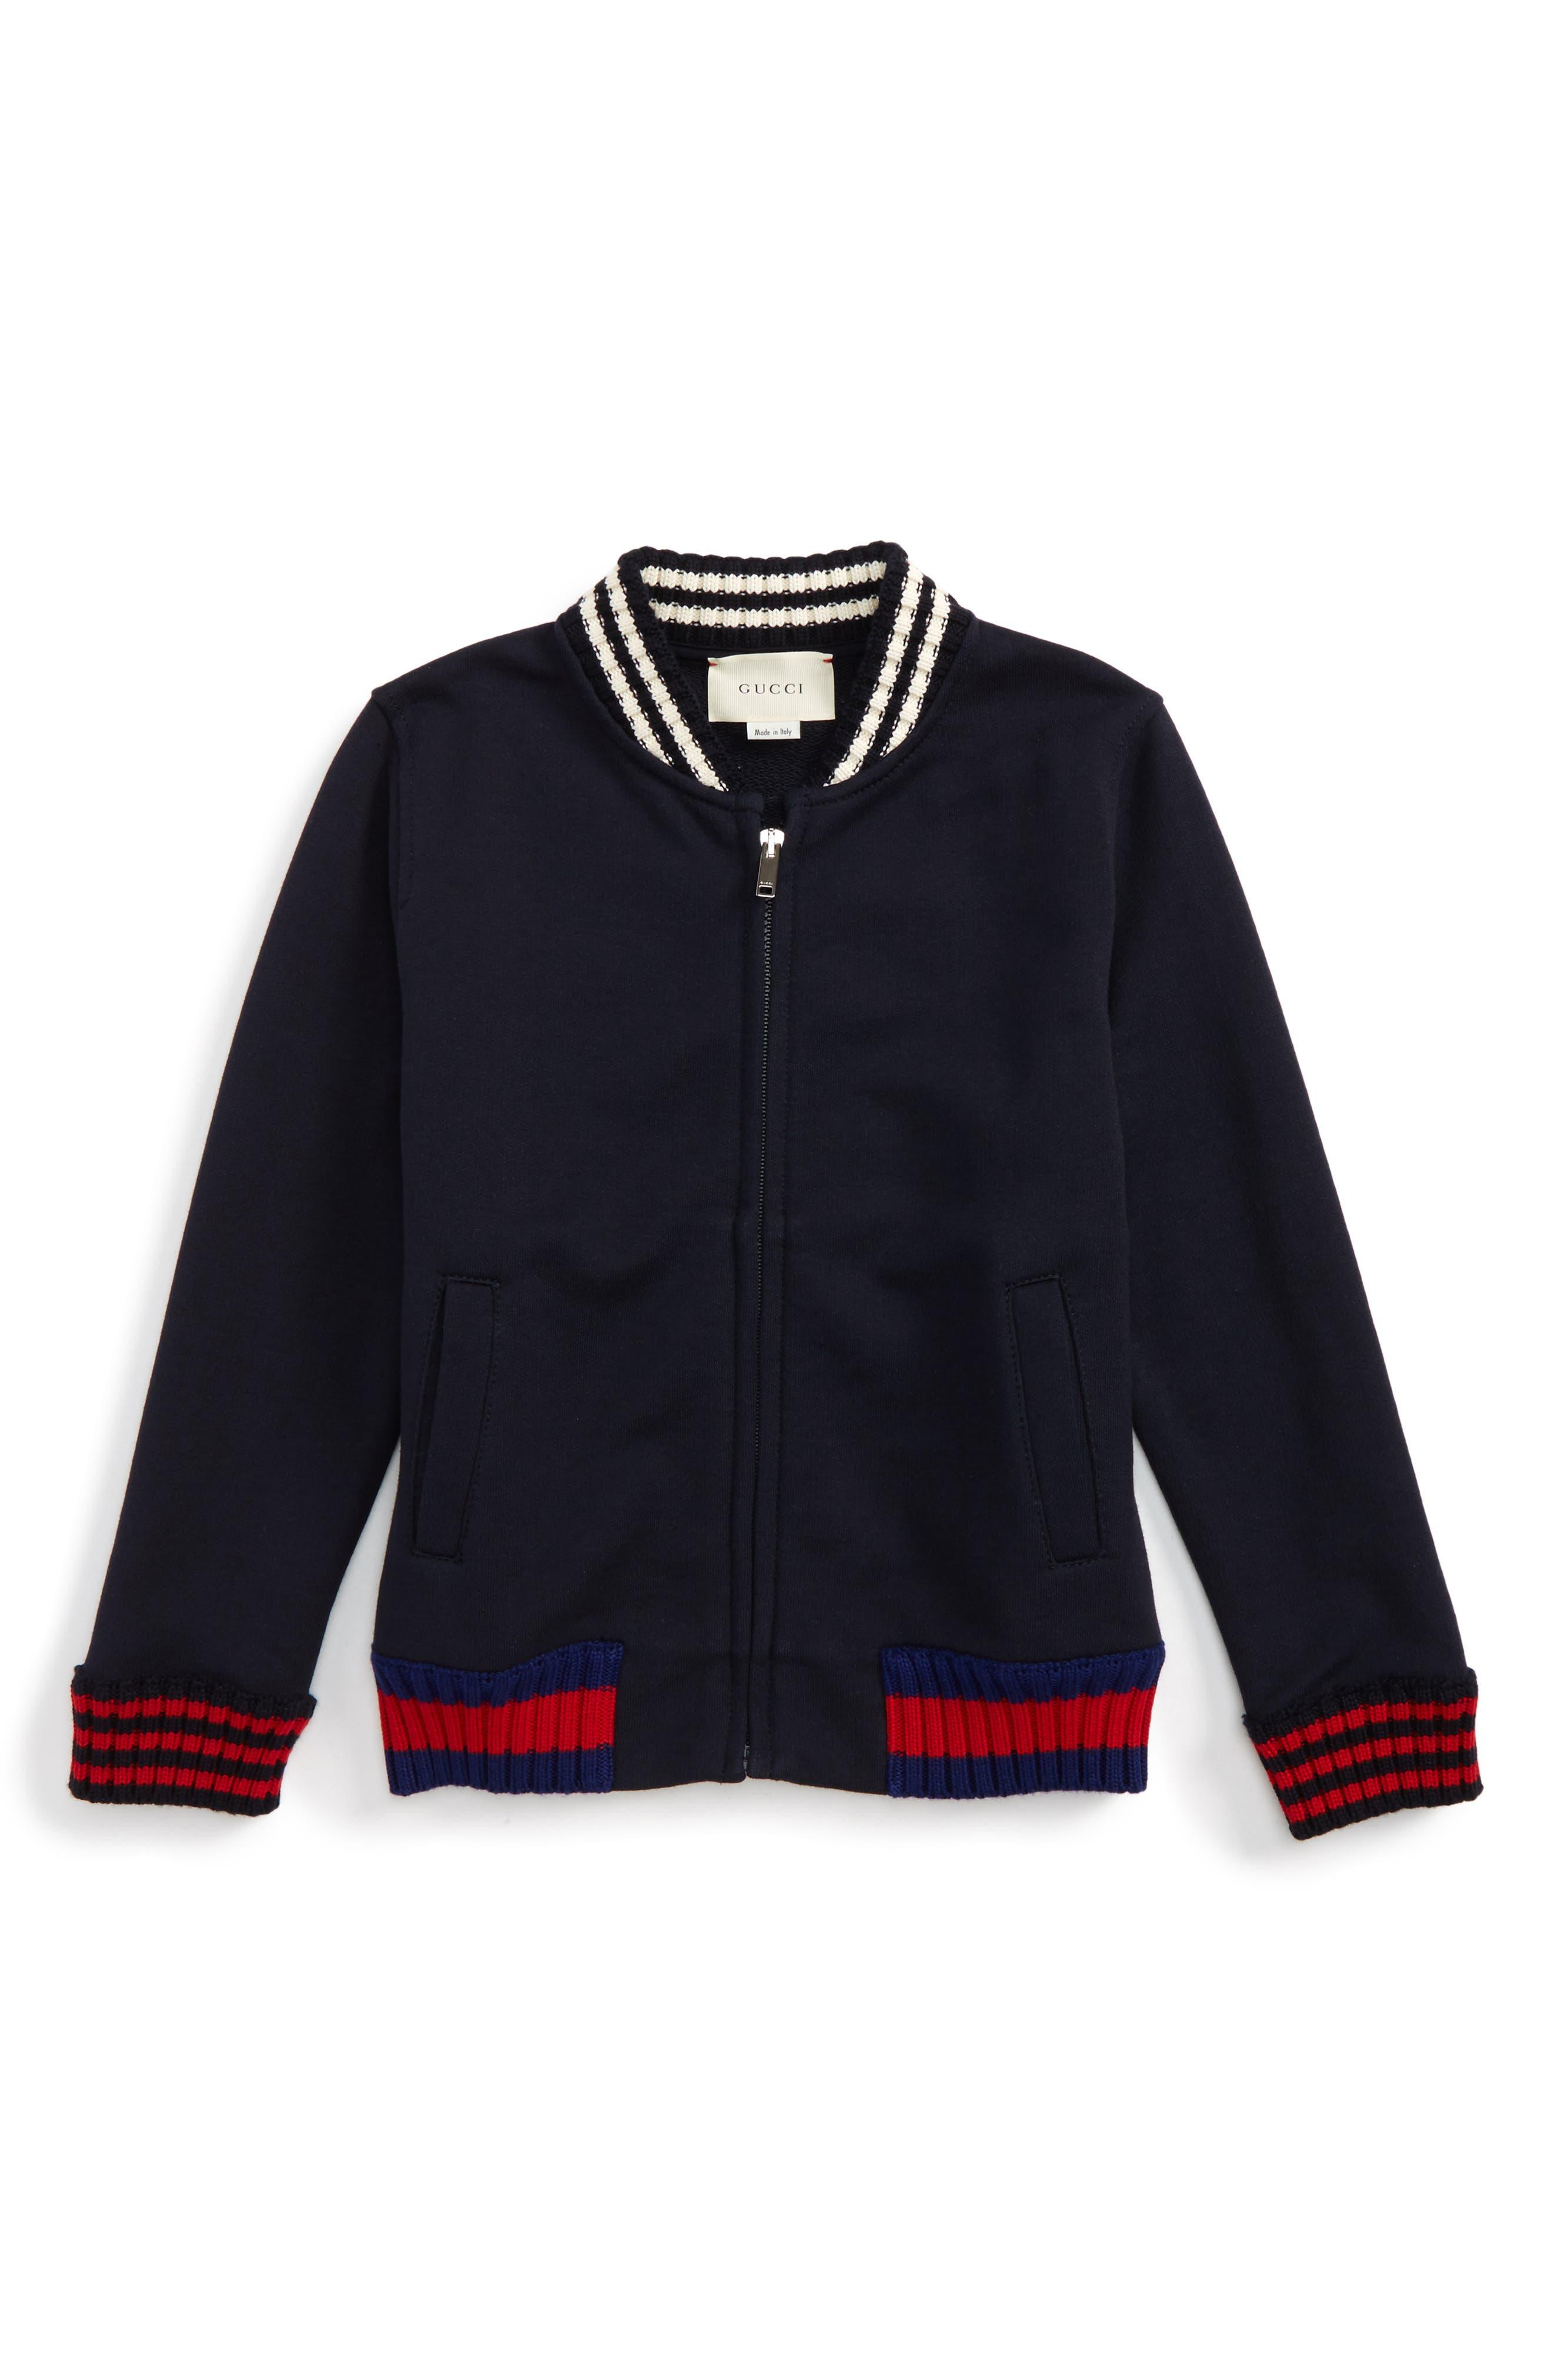 Gucci Rib Knit Trim Front Zip Sweatshirt (Little Boys & Big Boys)